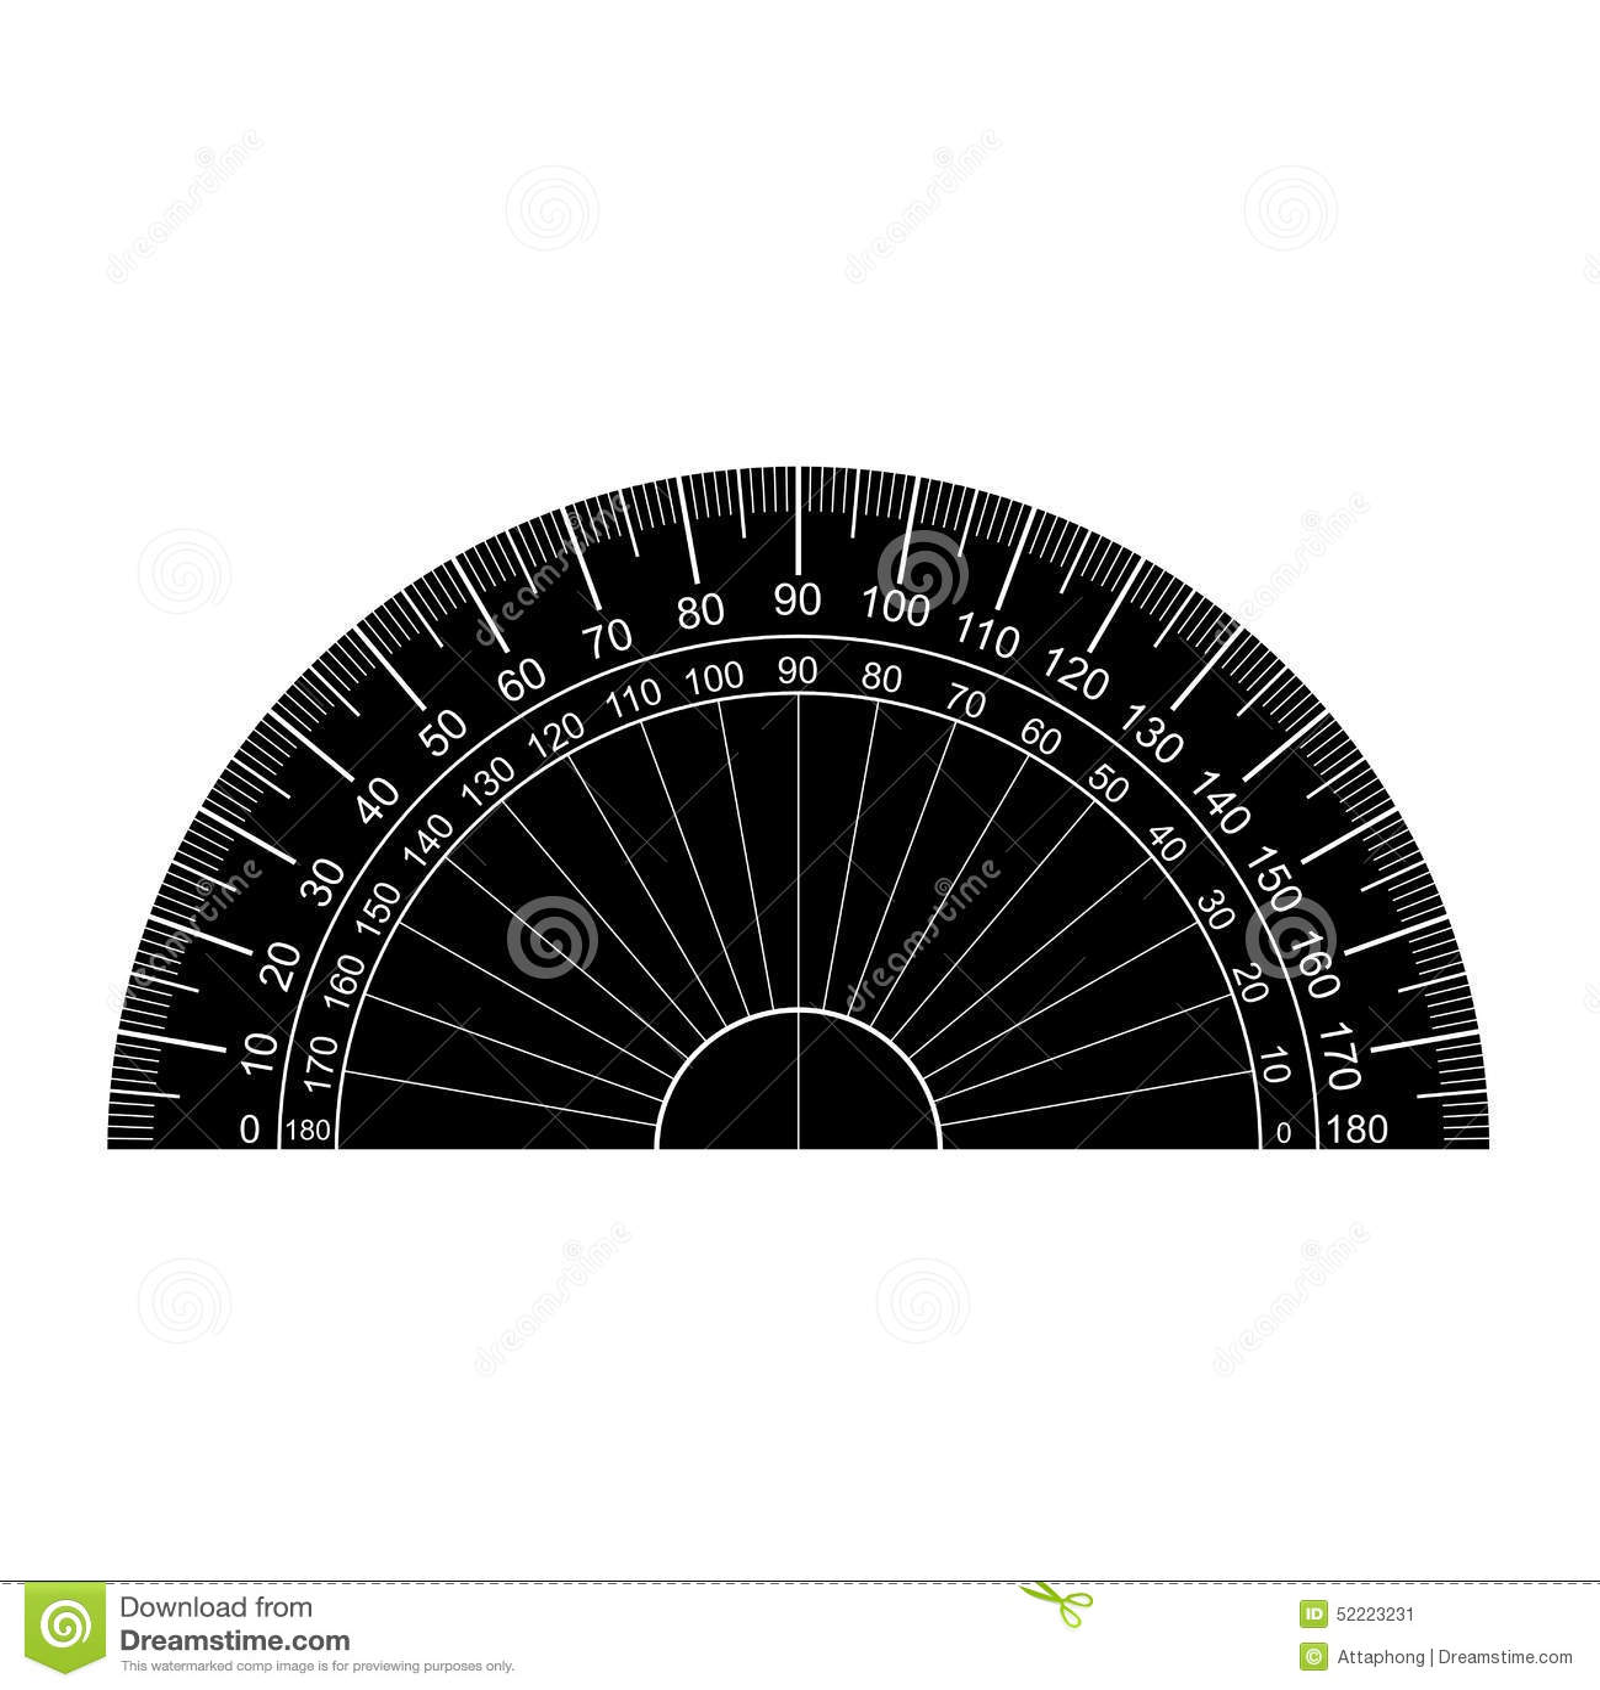 Protractor Silhouette Vector Stock Vector - Image: 52223231